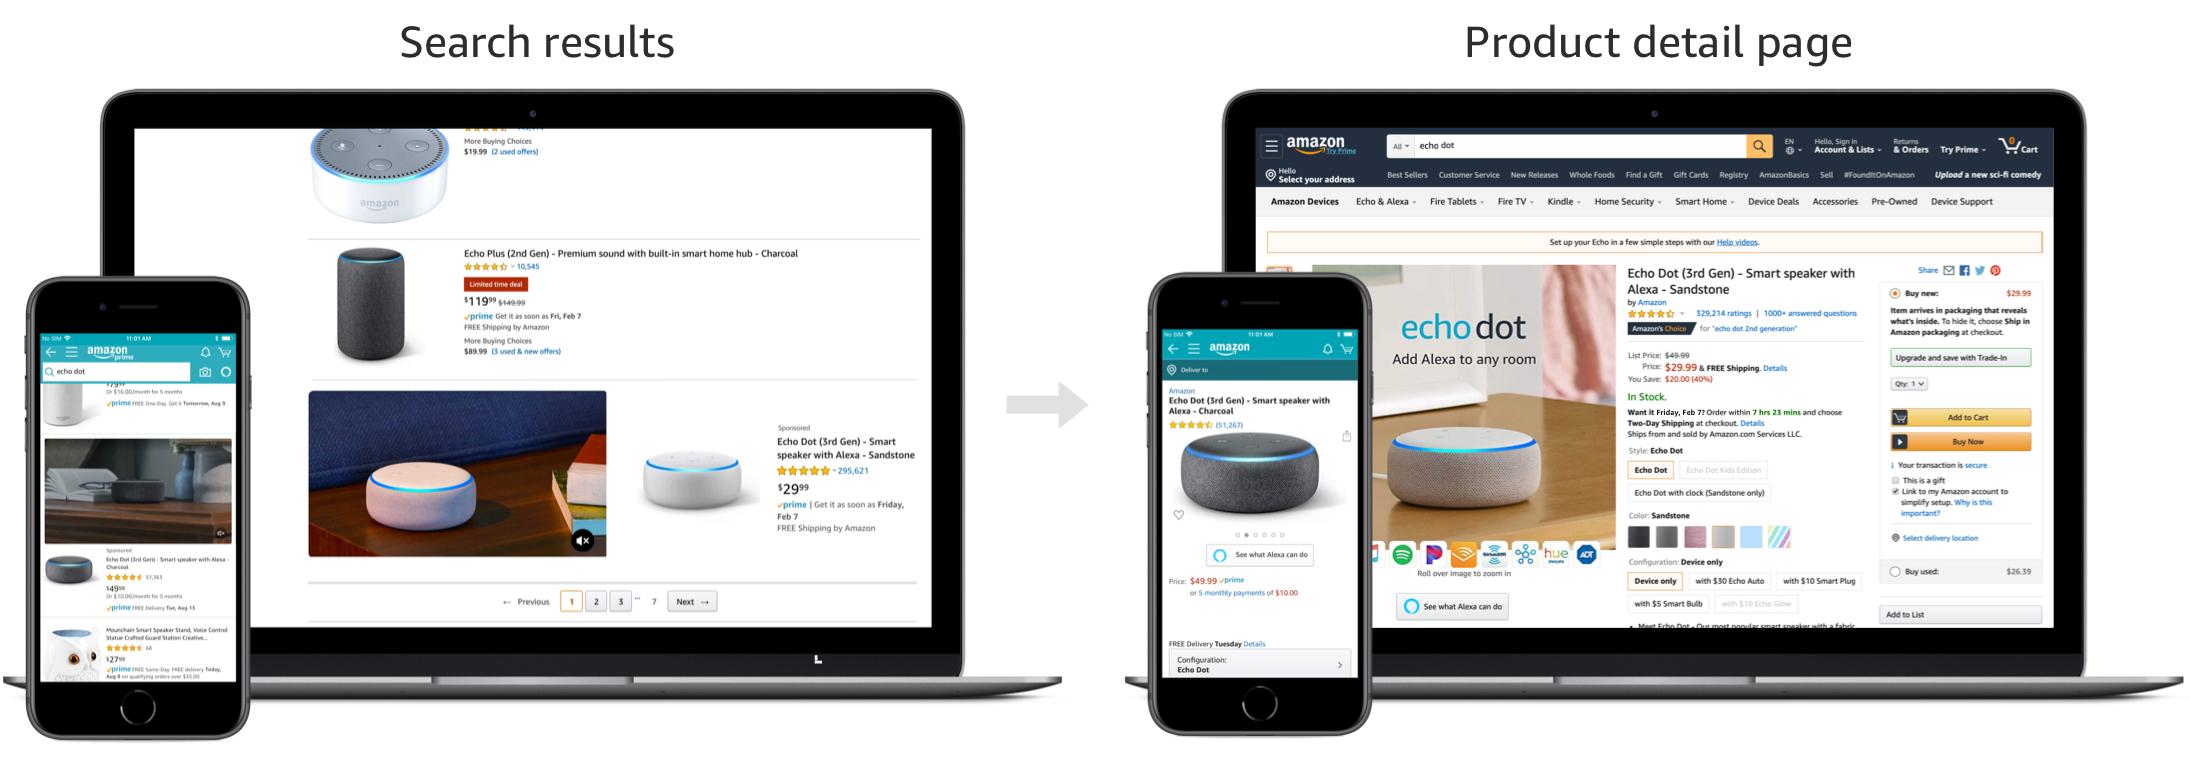 amazon-sponsored-brand-video-sbv-wiki-intomarkets